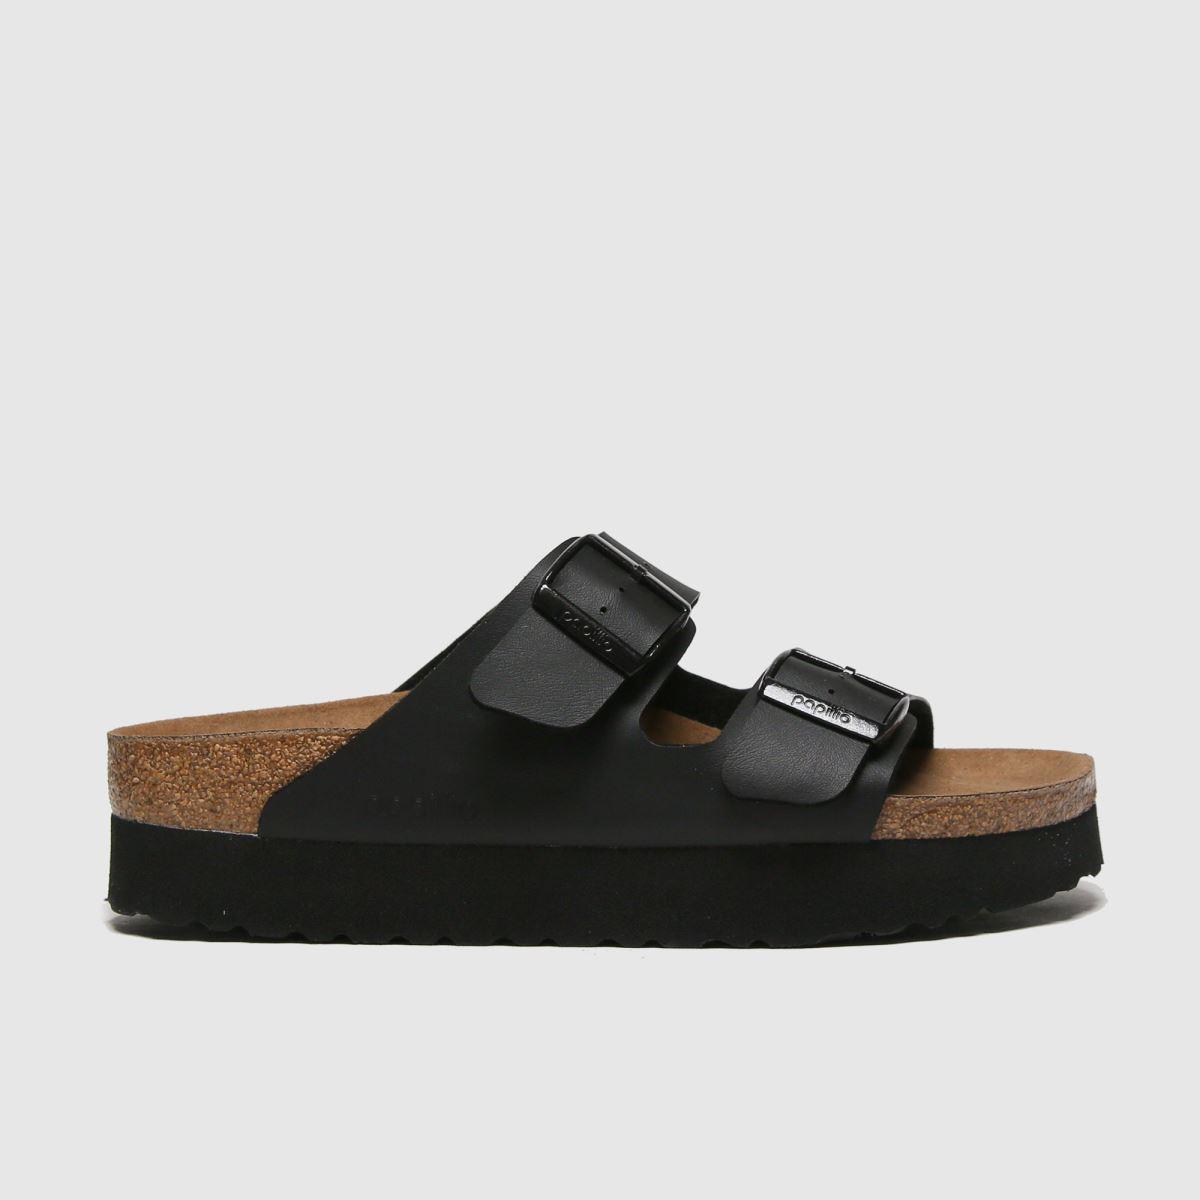 Birkenstock Black Papillio Platform Vegan Sandals